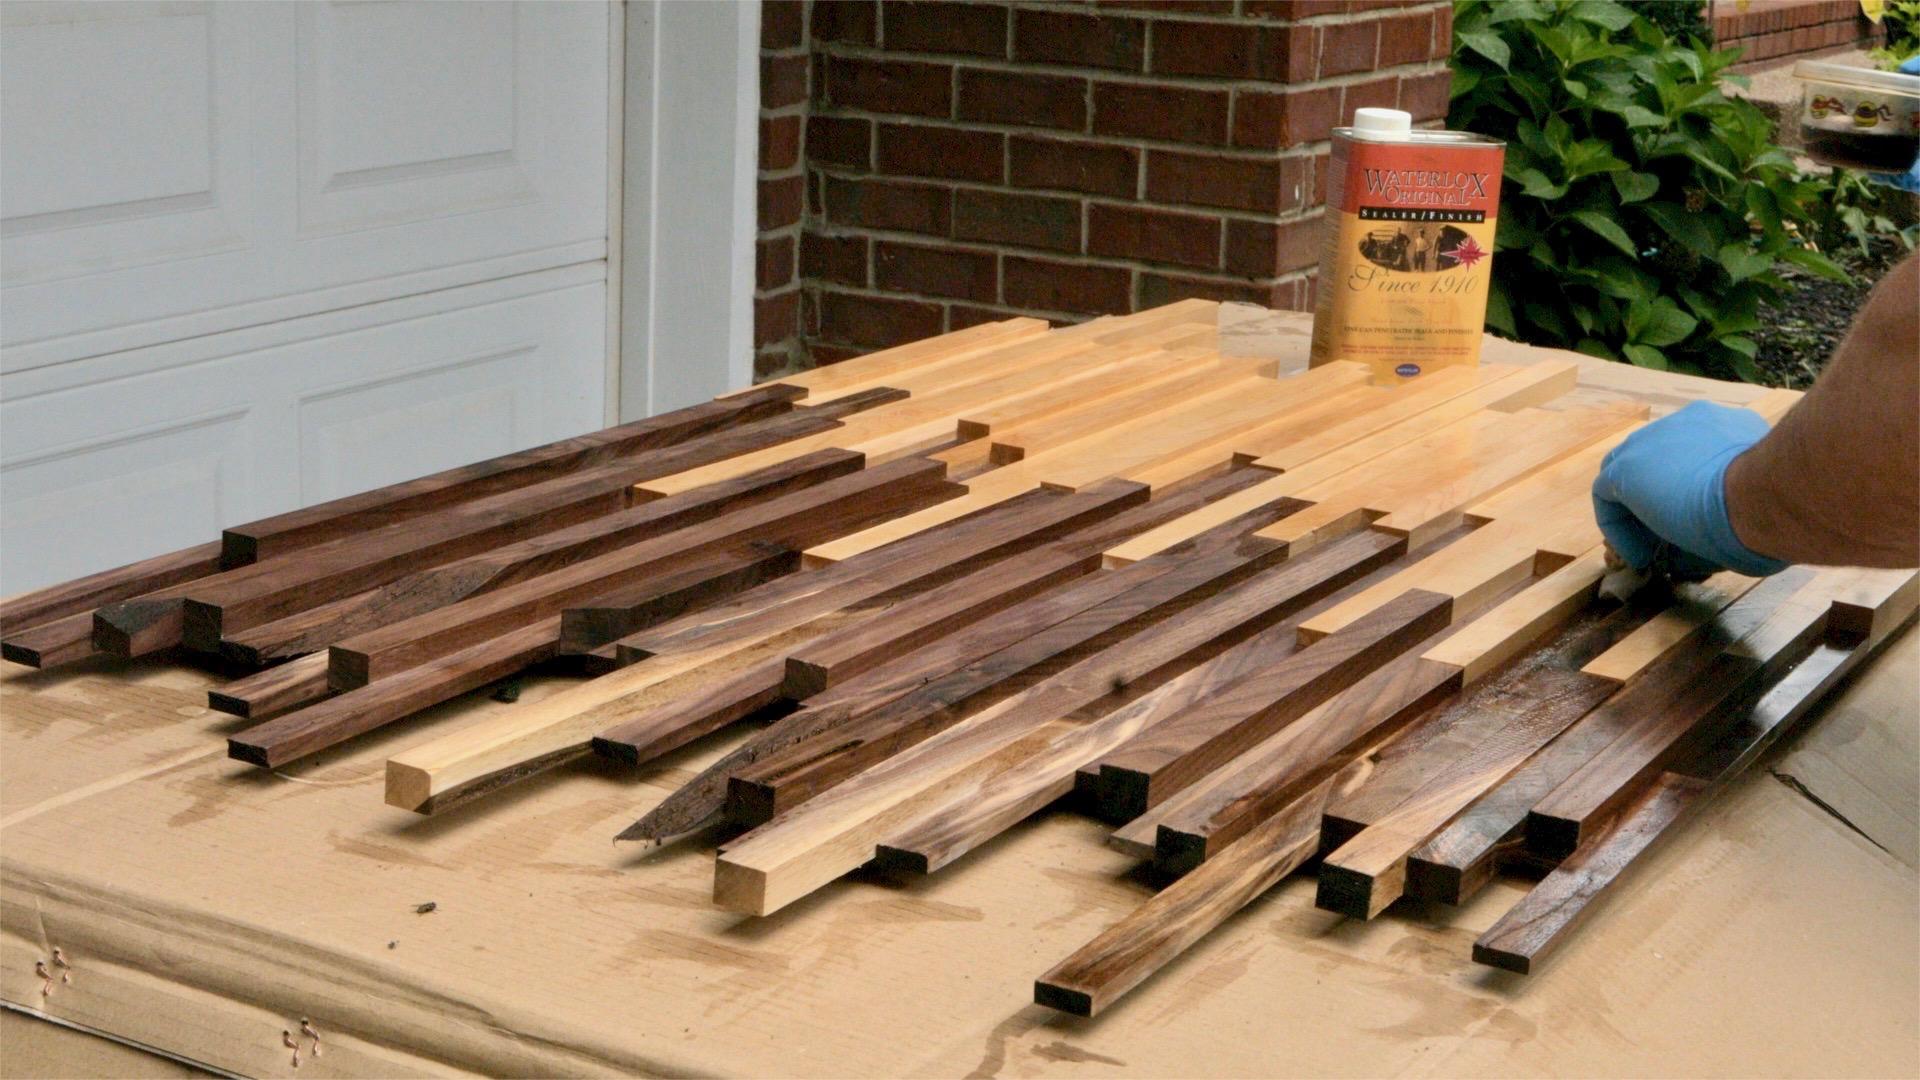 Applying Waterlox to scrap wood wall art.